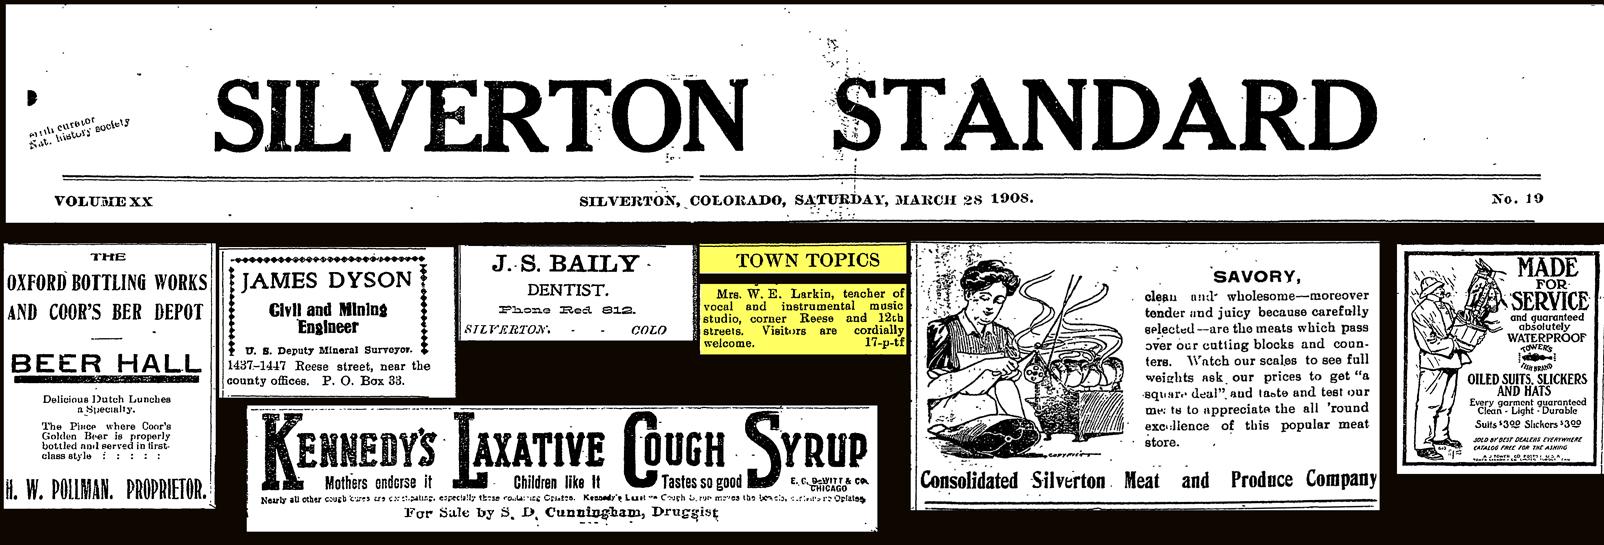 silverton standard march 28 1908